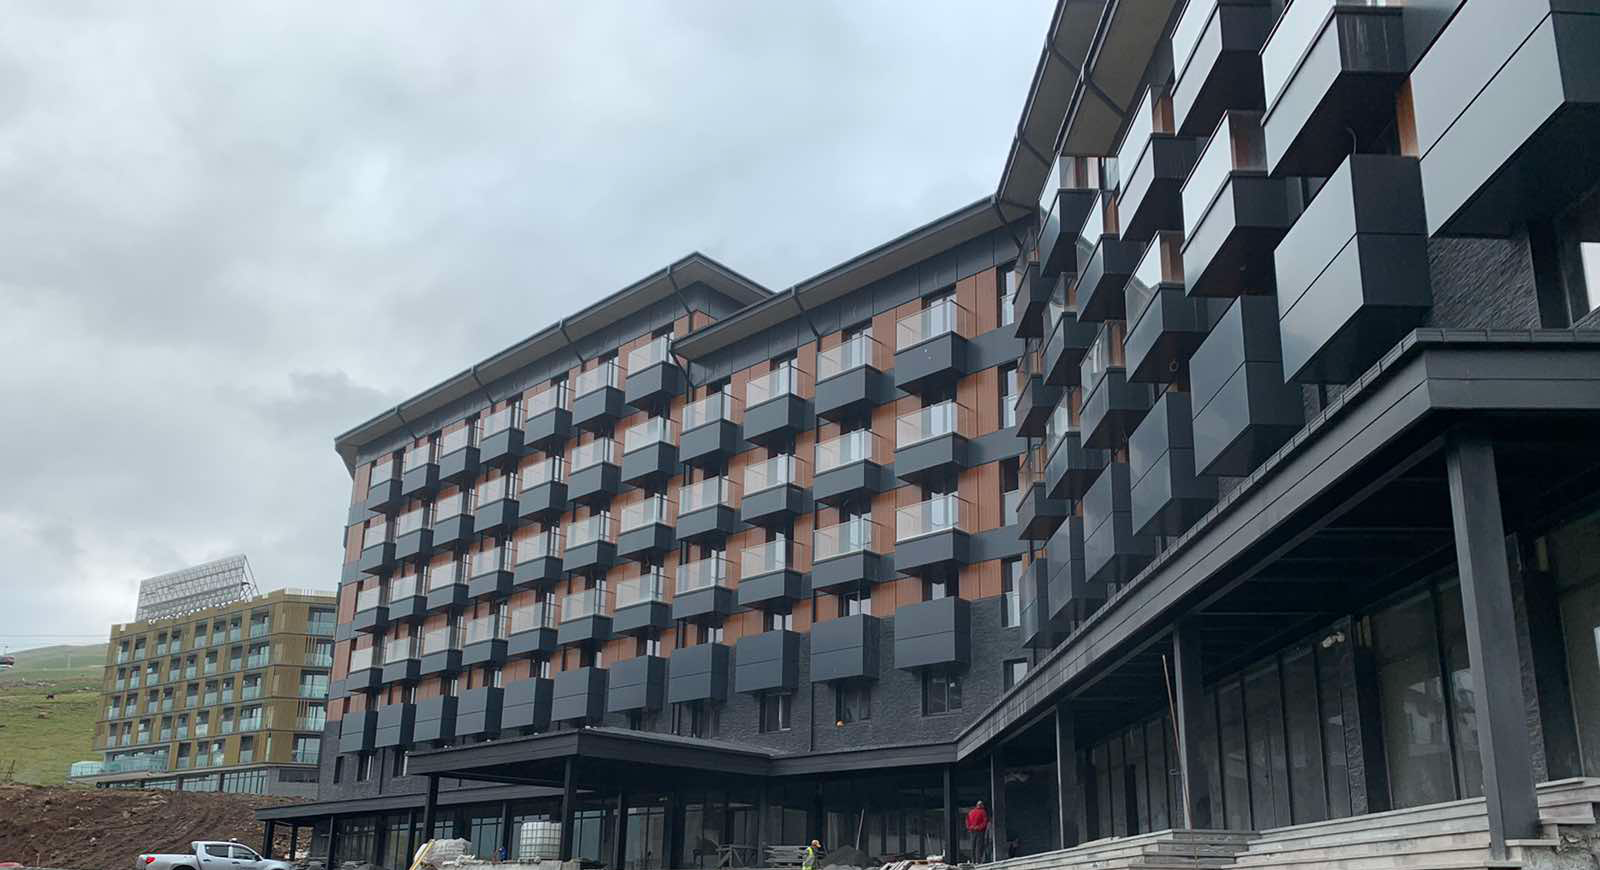 Hotel NEO in Gudauri